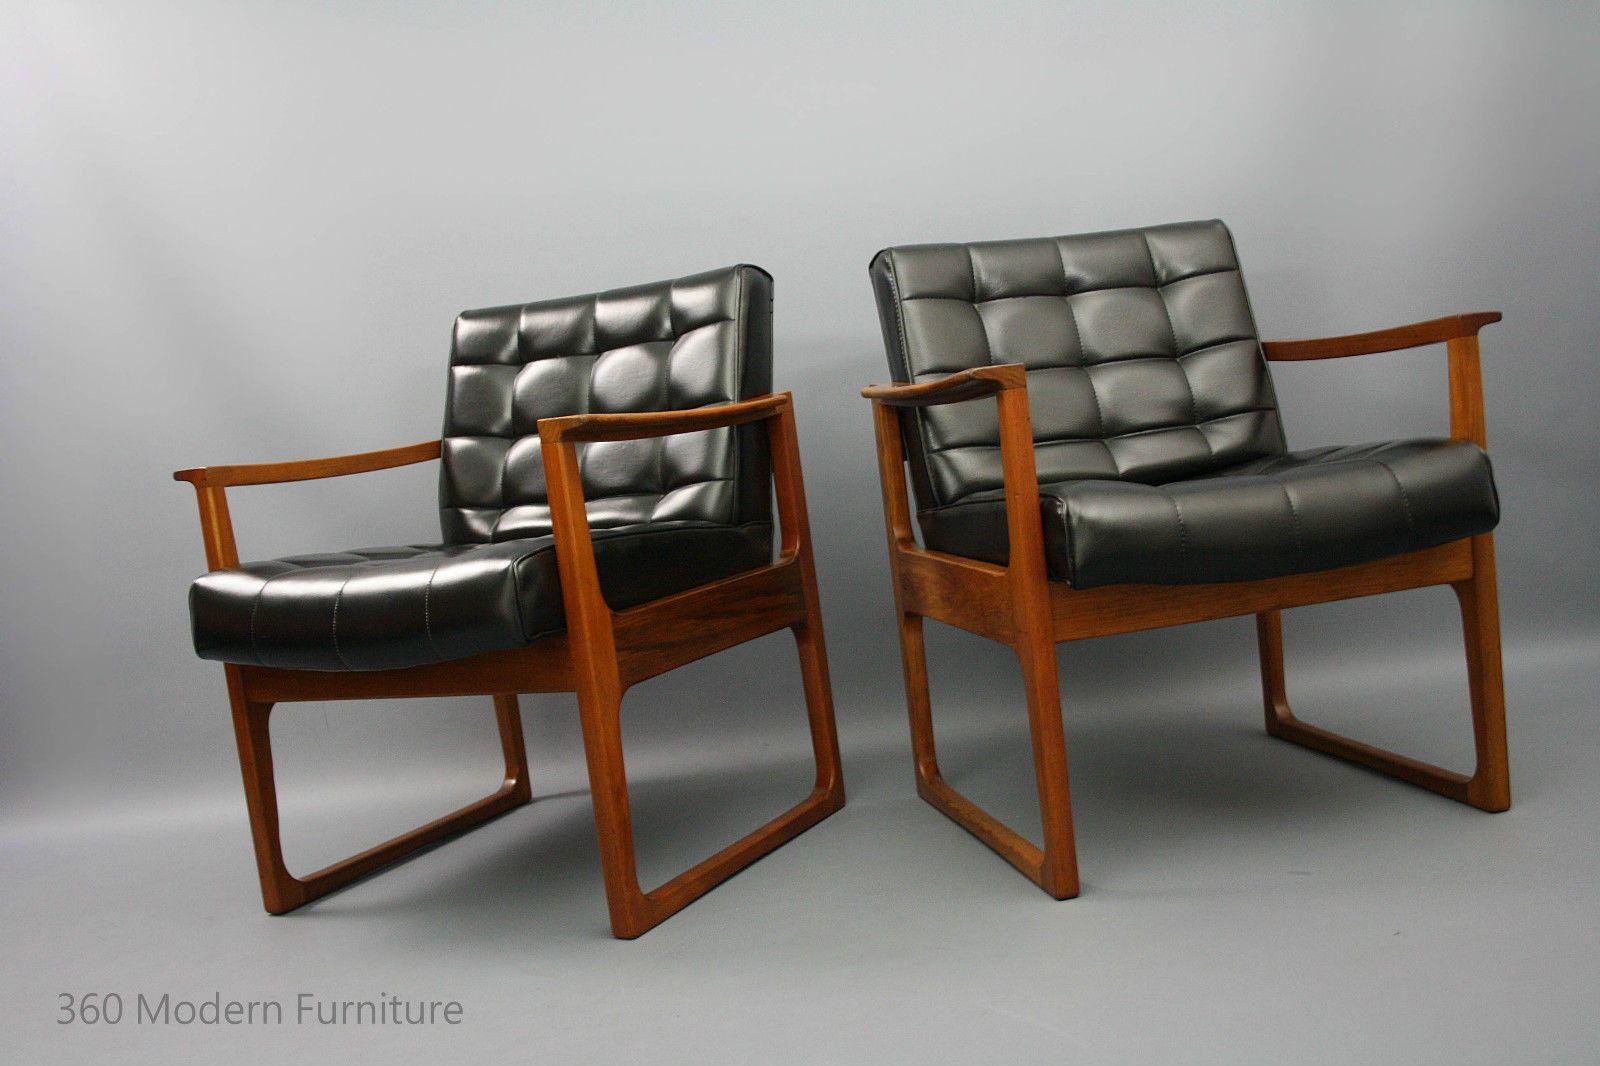 Mid Century Armchairs X 2 Gerald Easden For Module 1970s Retro Vintage Lounge Chairs Danish Era In Vic 360 Modern Furniture Ebay